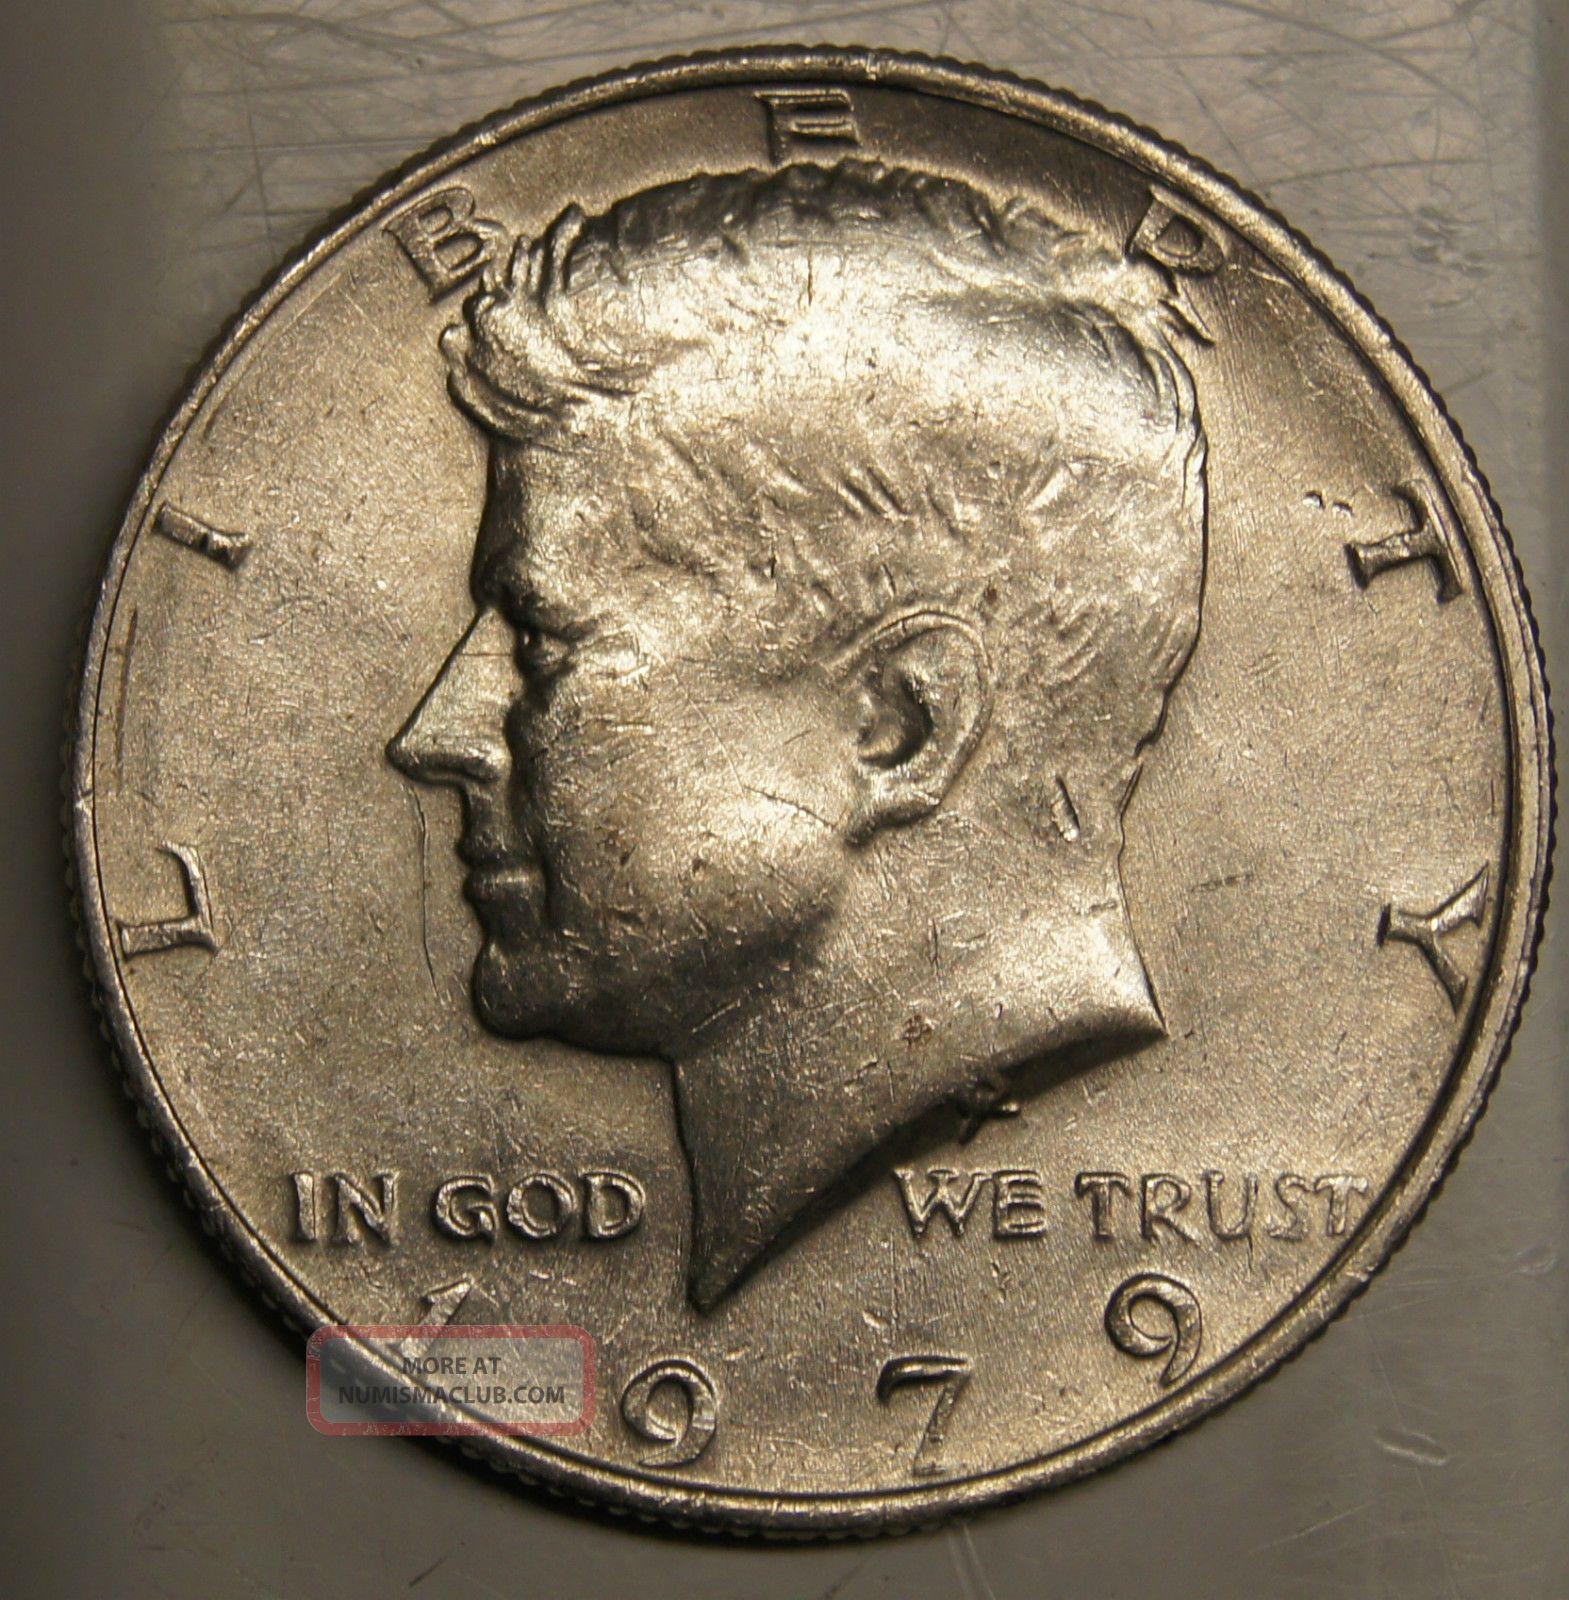 1979 50 Fifty Cents Kennedy Half Dollar - Grease Weak Strike Error